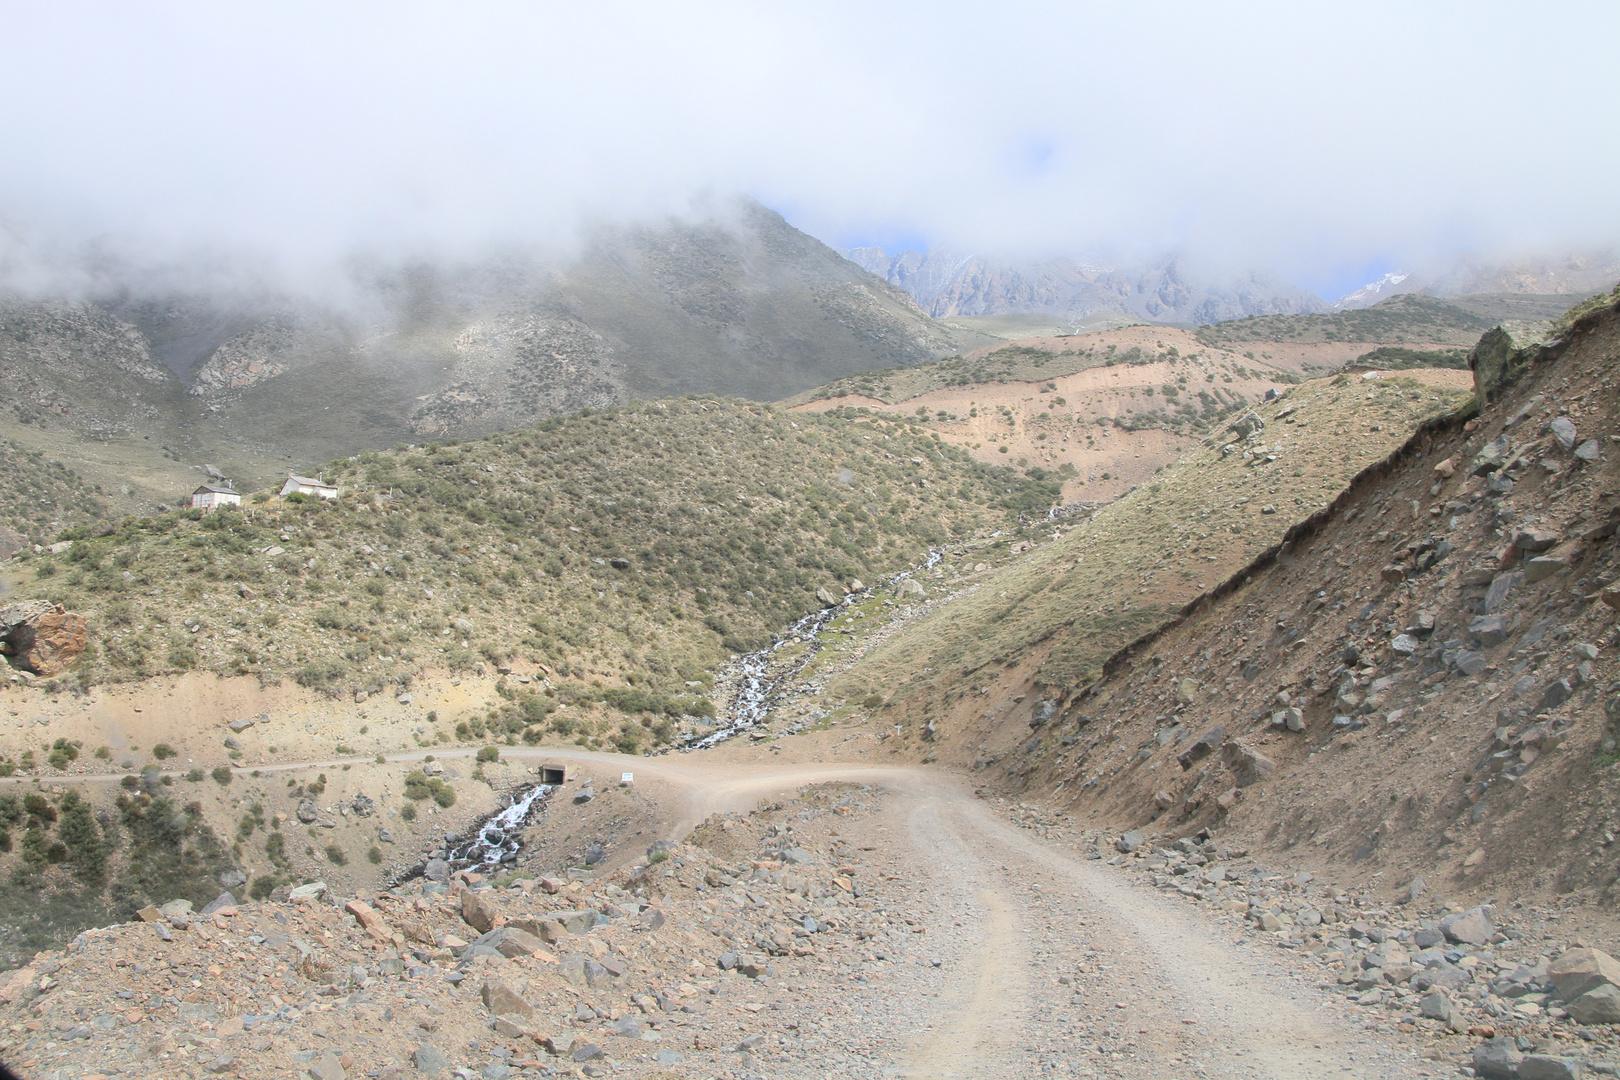 Straße nach Vallecitos (Provinz Mendoza)